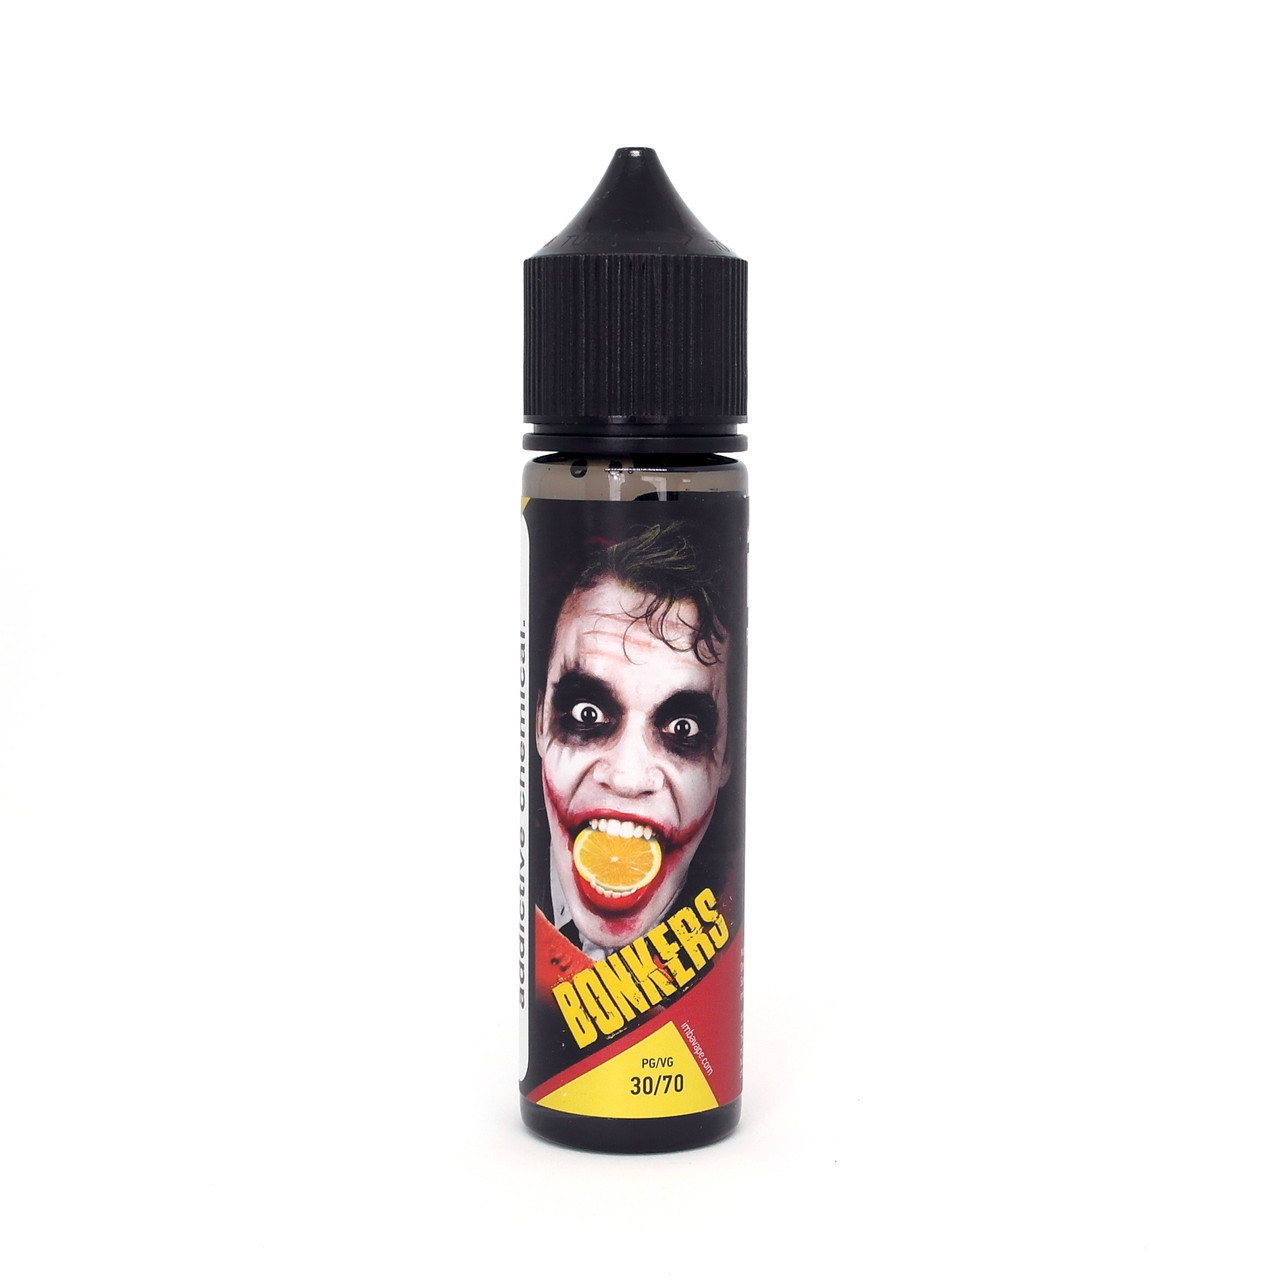 Жидкость для электронных сигарет Imba Bonkers 3 мг 60 мл